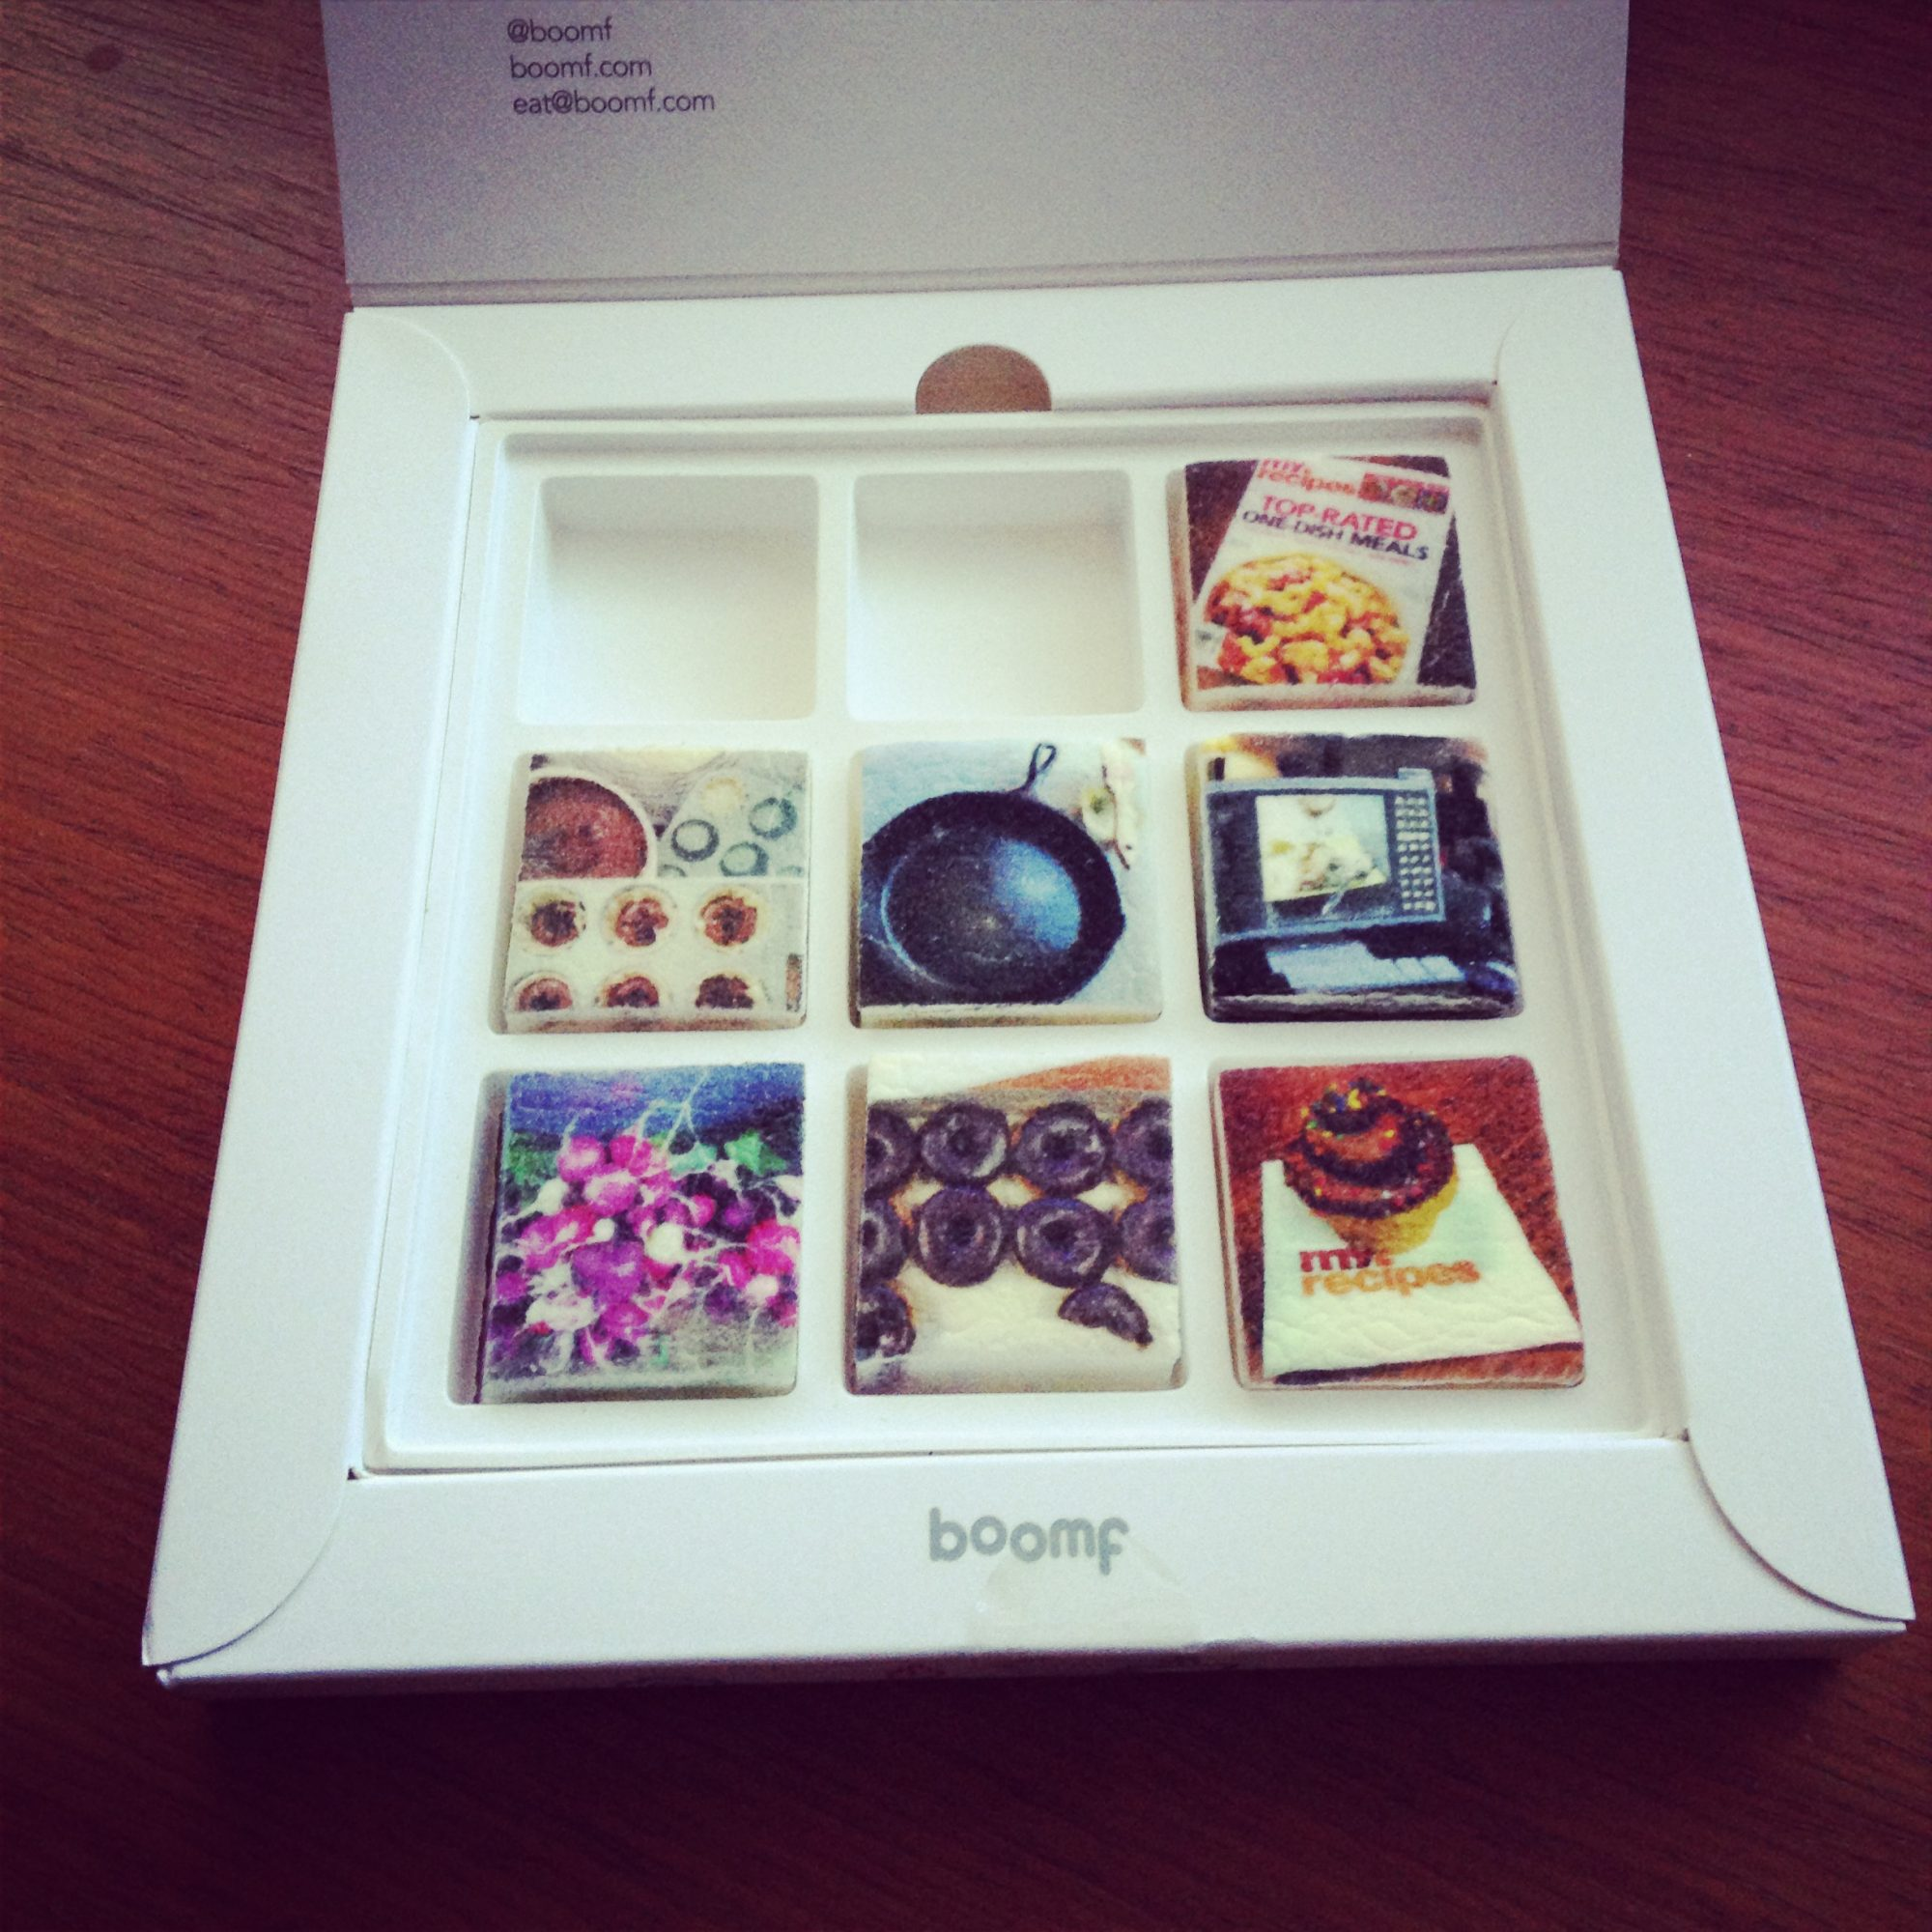 Boomf Makes Instagram Edible